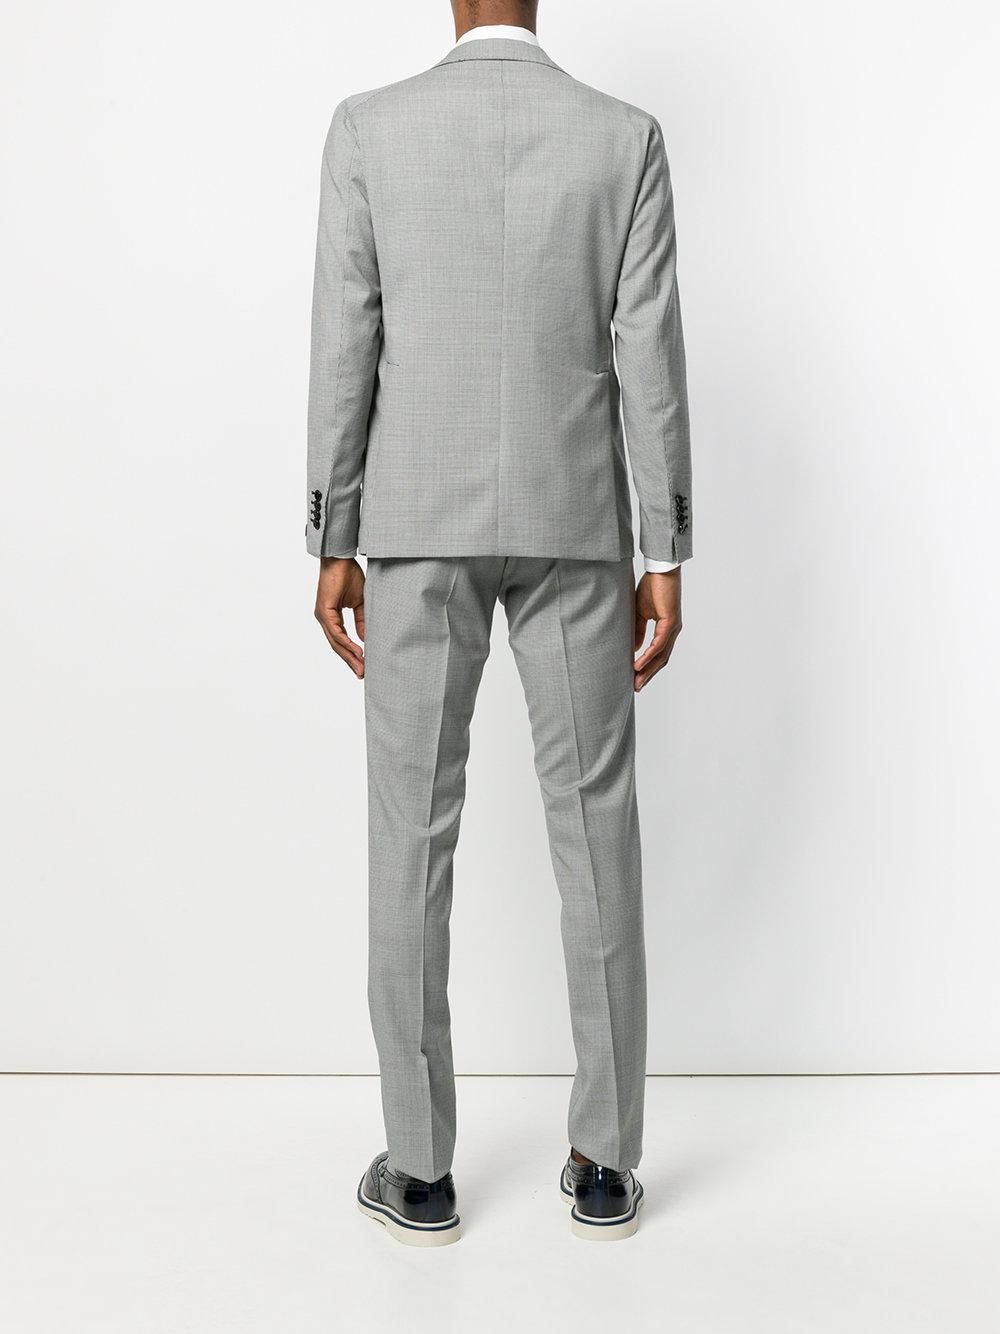 44d5062e9361 Tagliatore Pied Pool Suit in Black for Men - Lyst